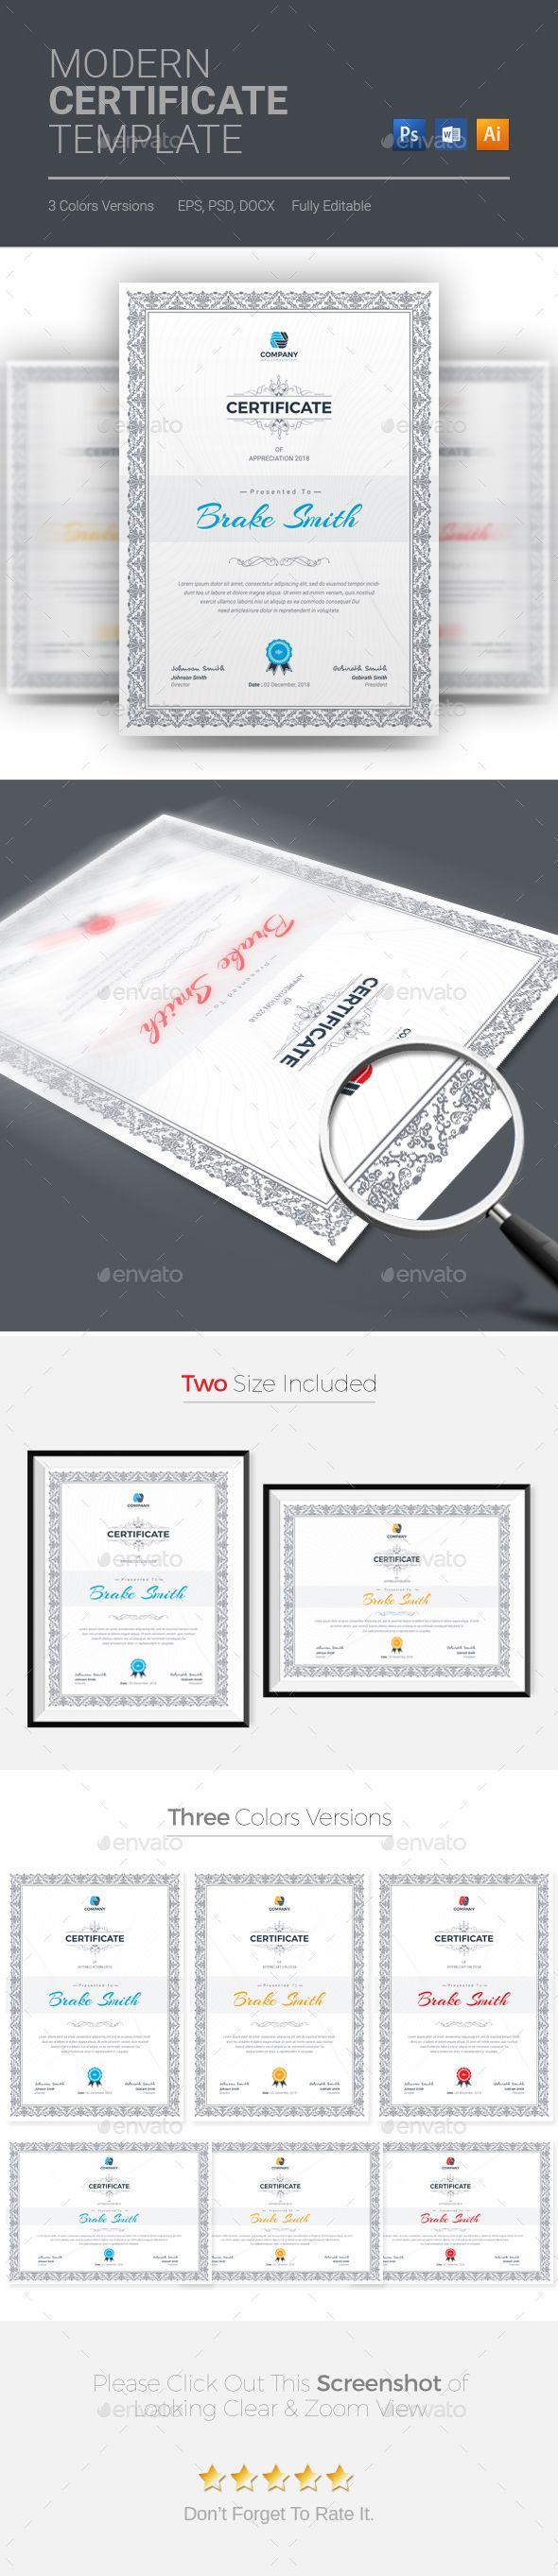 135 best award certificates images on pinterest award certificate yelopaper Images